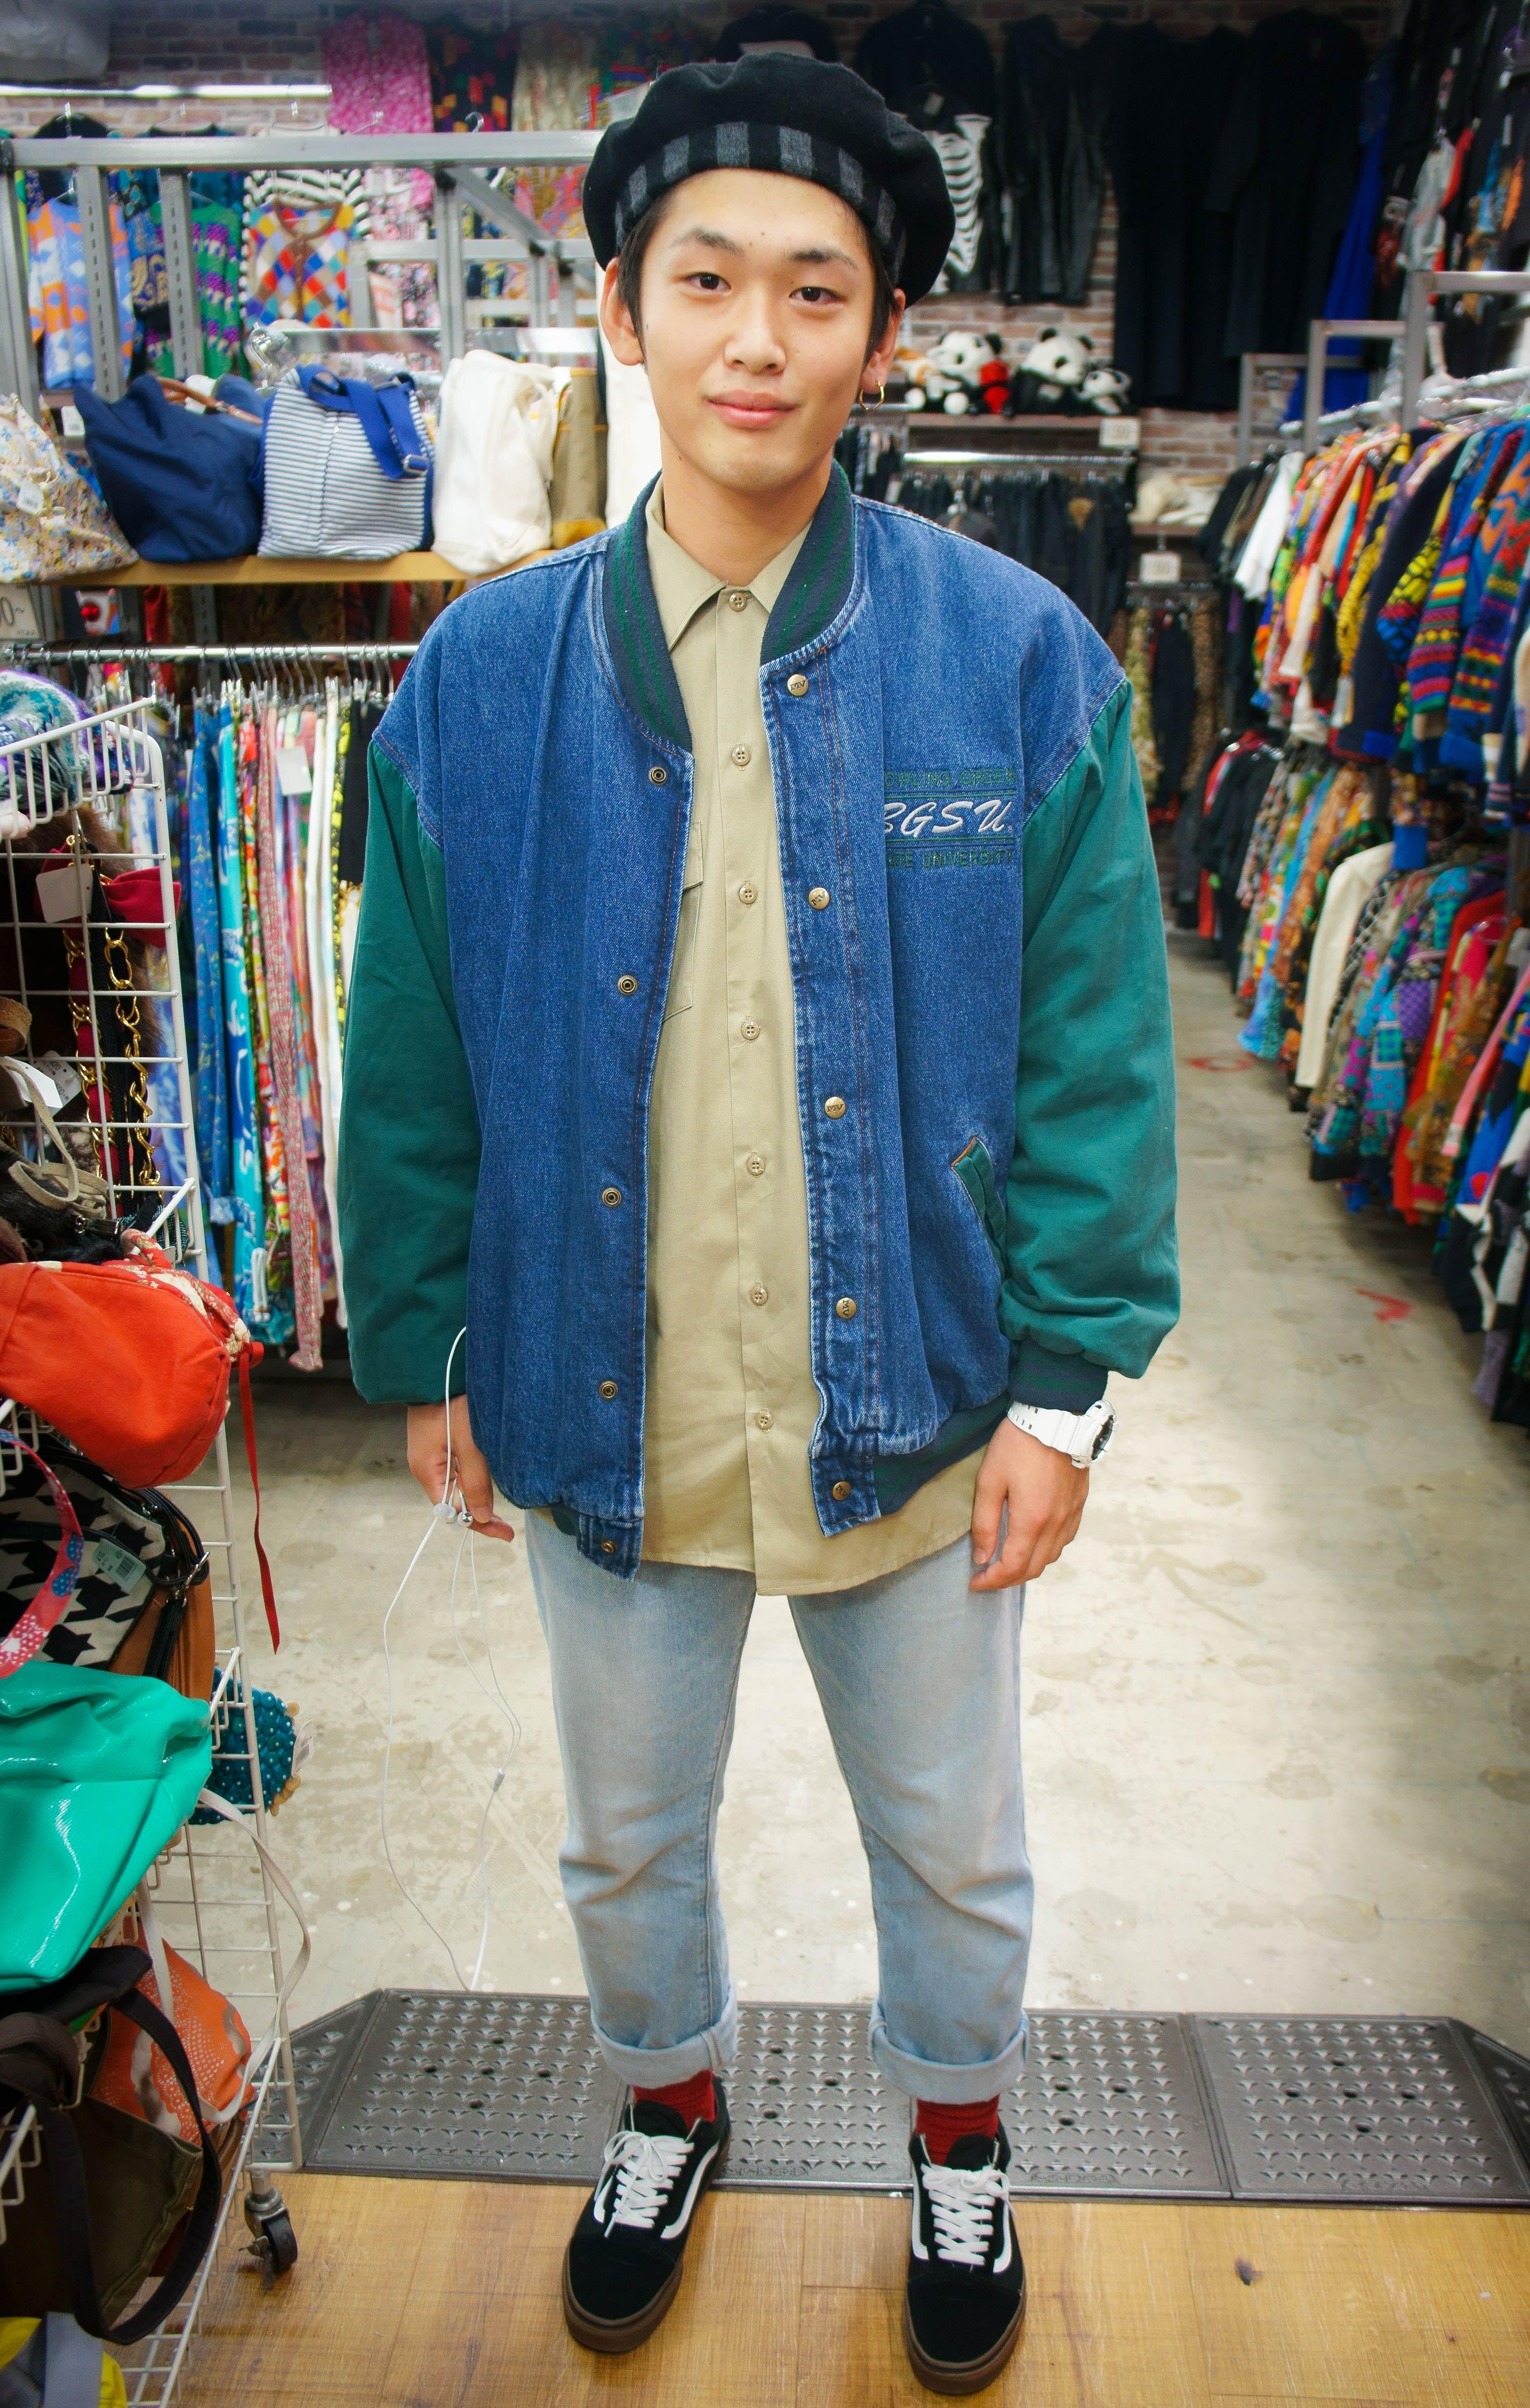 Streetwear Japan Men Fashion Mens Street Style Retro Outfits